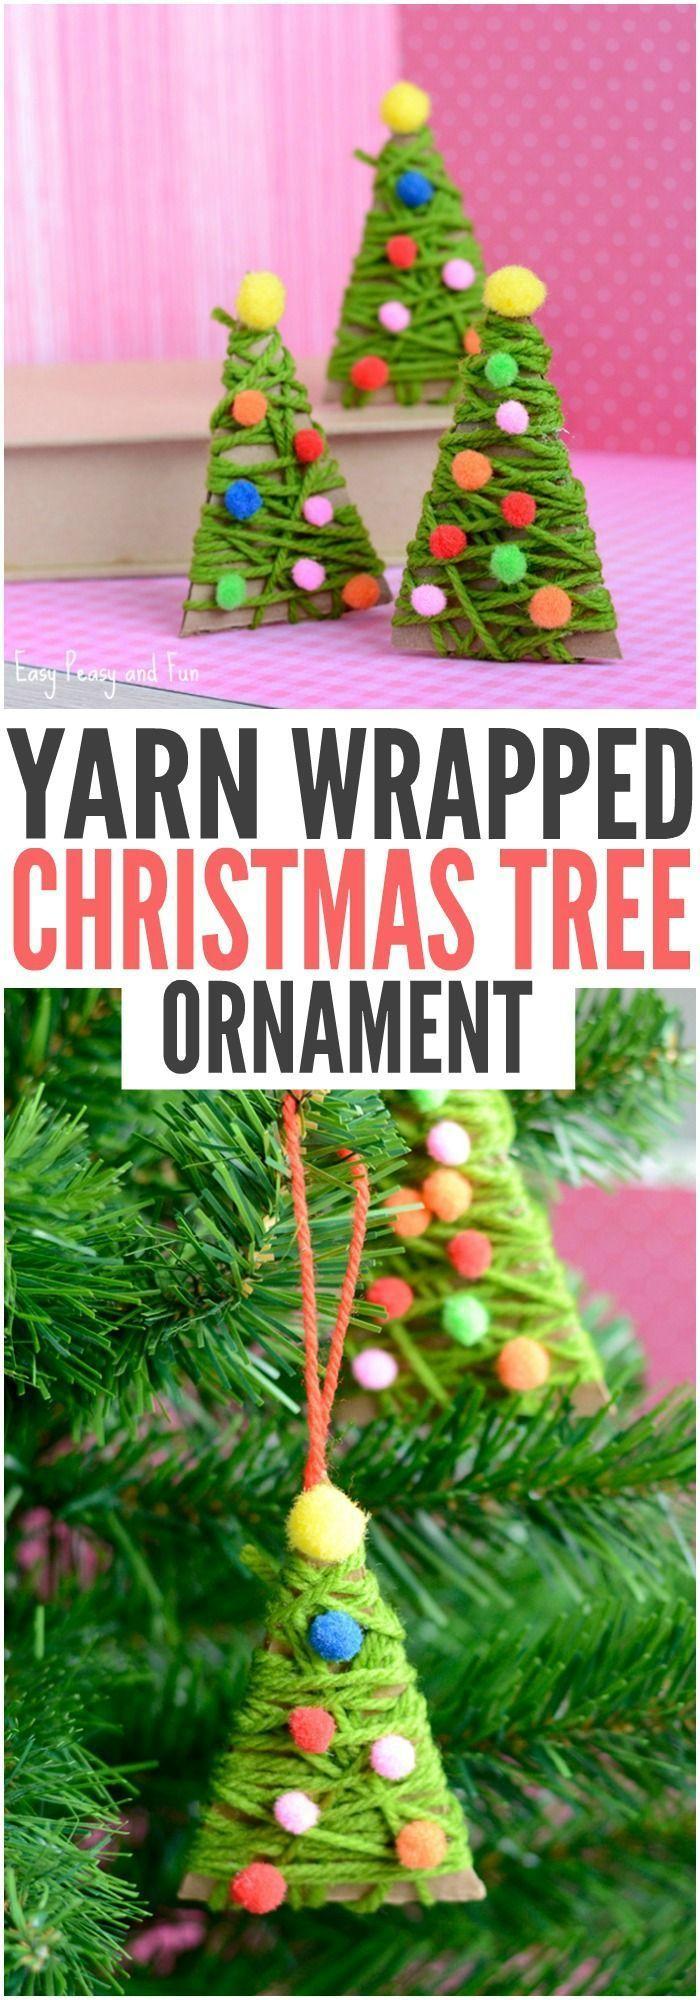 DIY Yarn Wrapped Christmas Tree Ornament